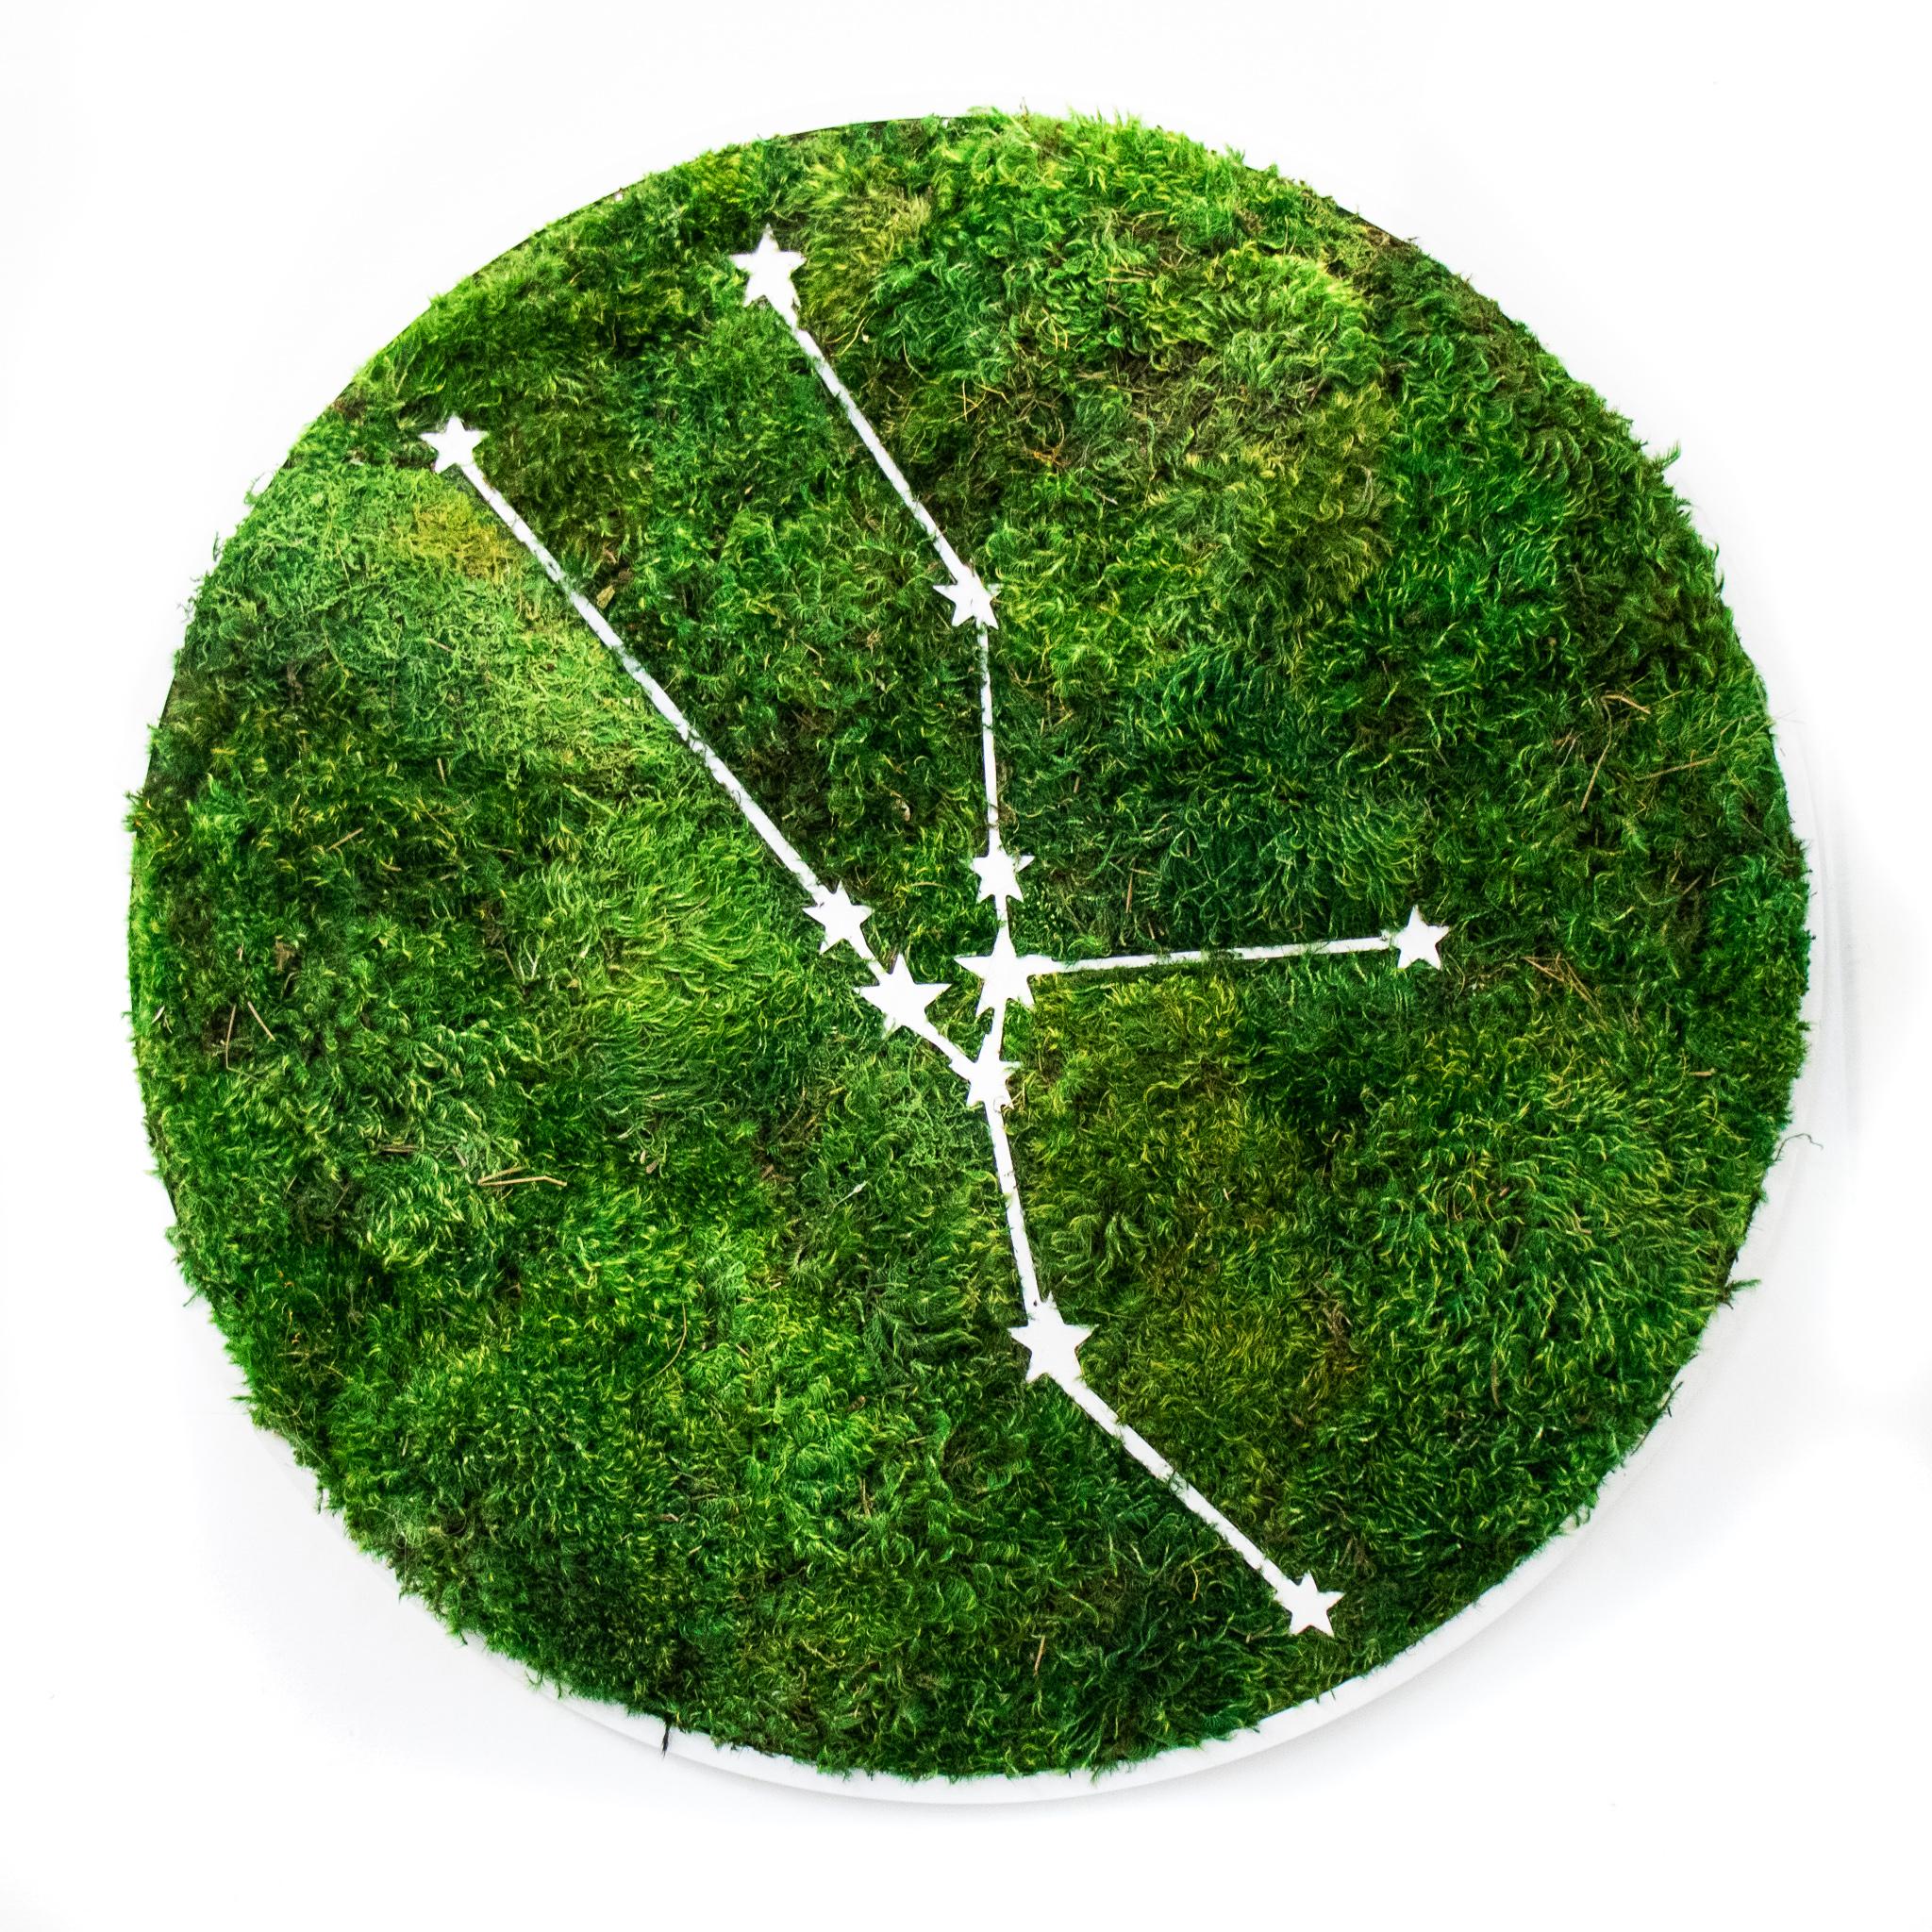 "Taurus Constellation - Moss Wall Art (30"" H x 30"" W)"